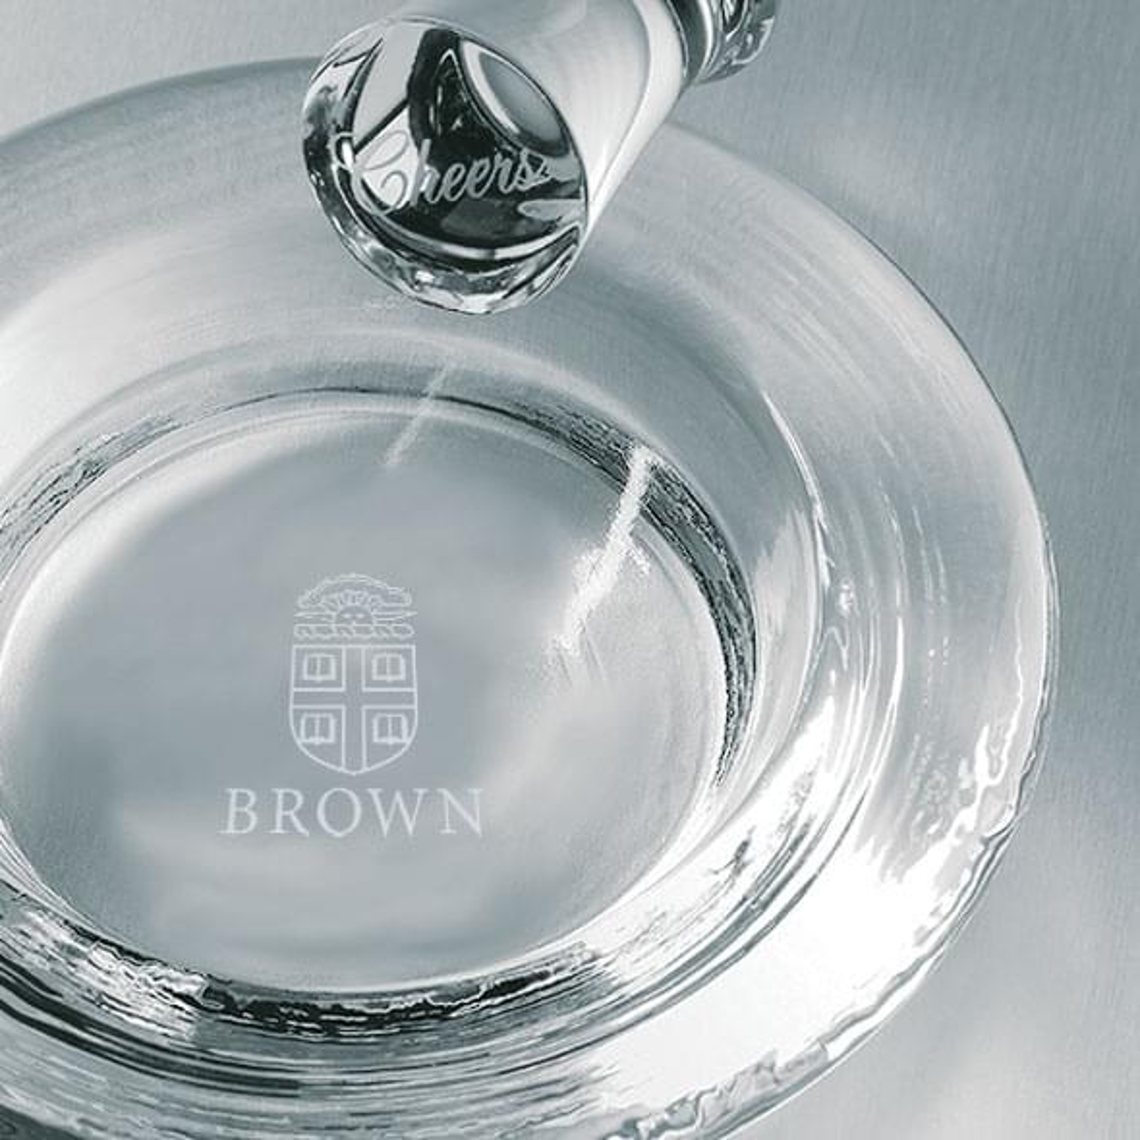 Brown Glass Wine Coaster by Simon Pearce - Image 2